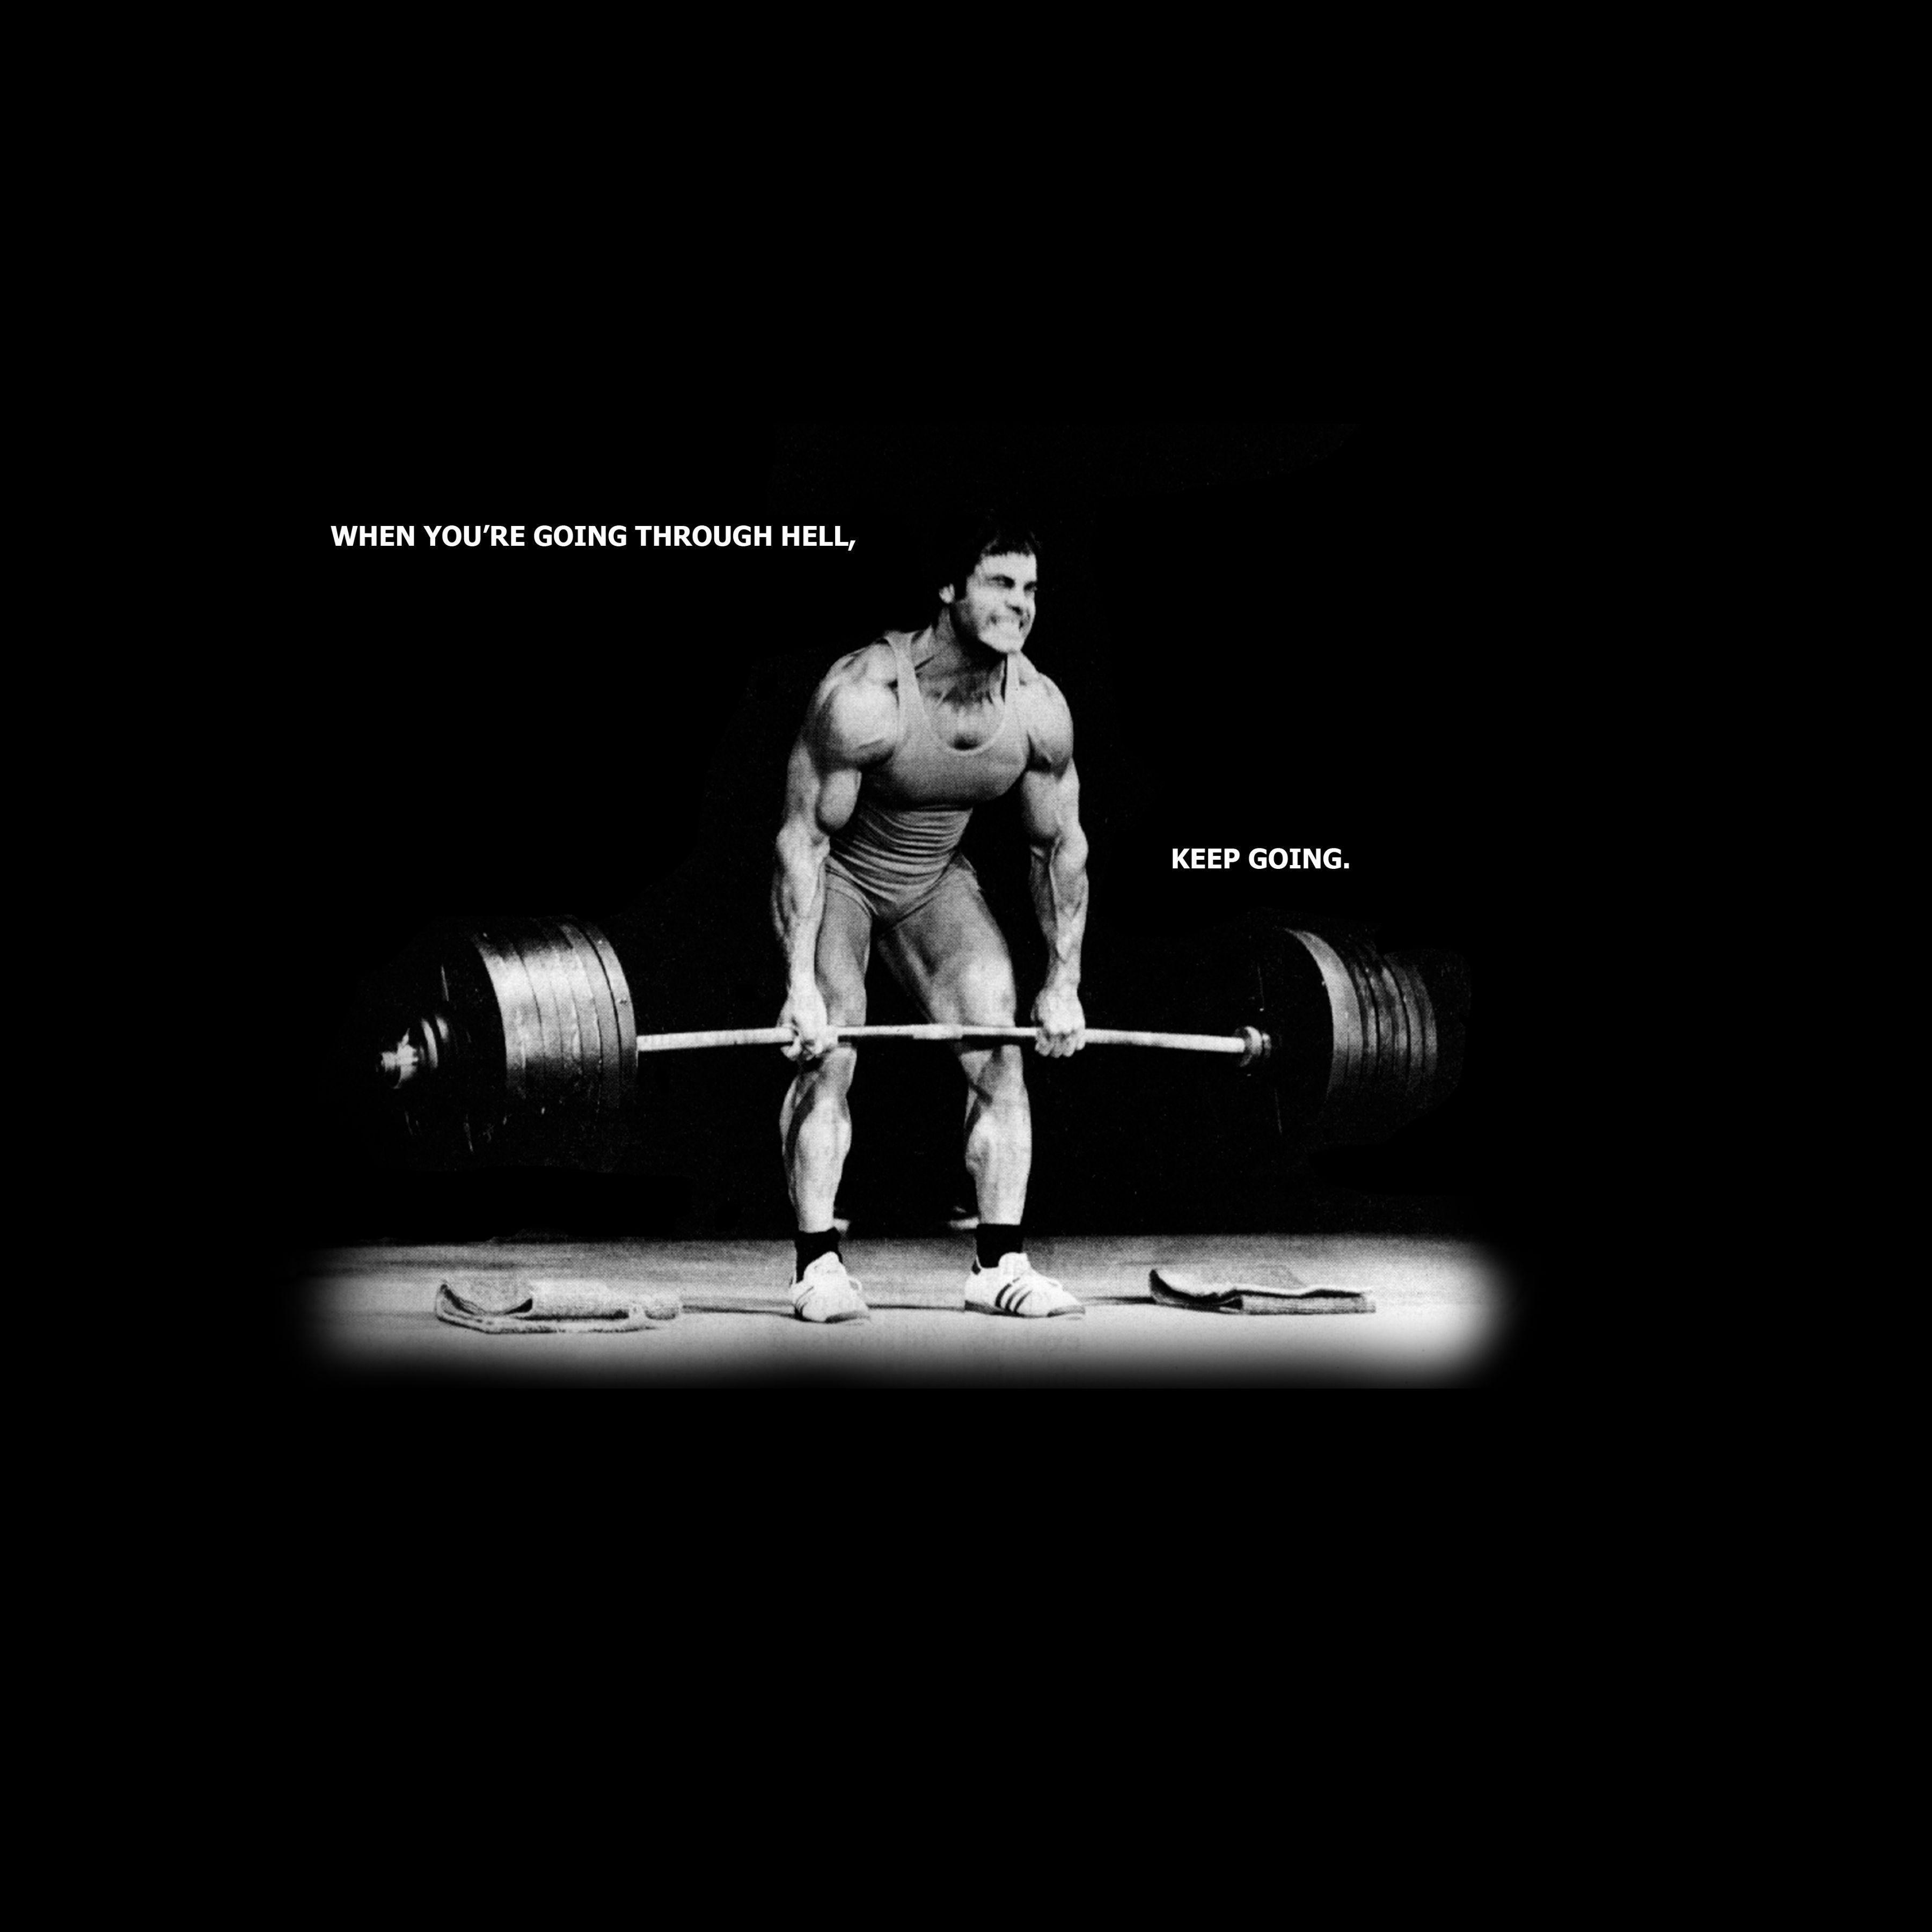 Bodybuilding Motivational Wallpapers - Top Free Bodybuilding